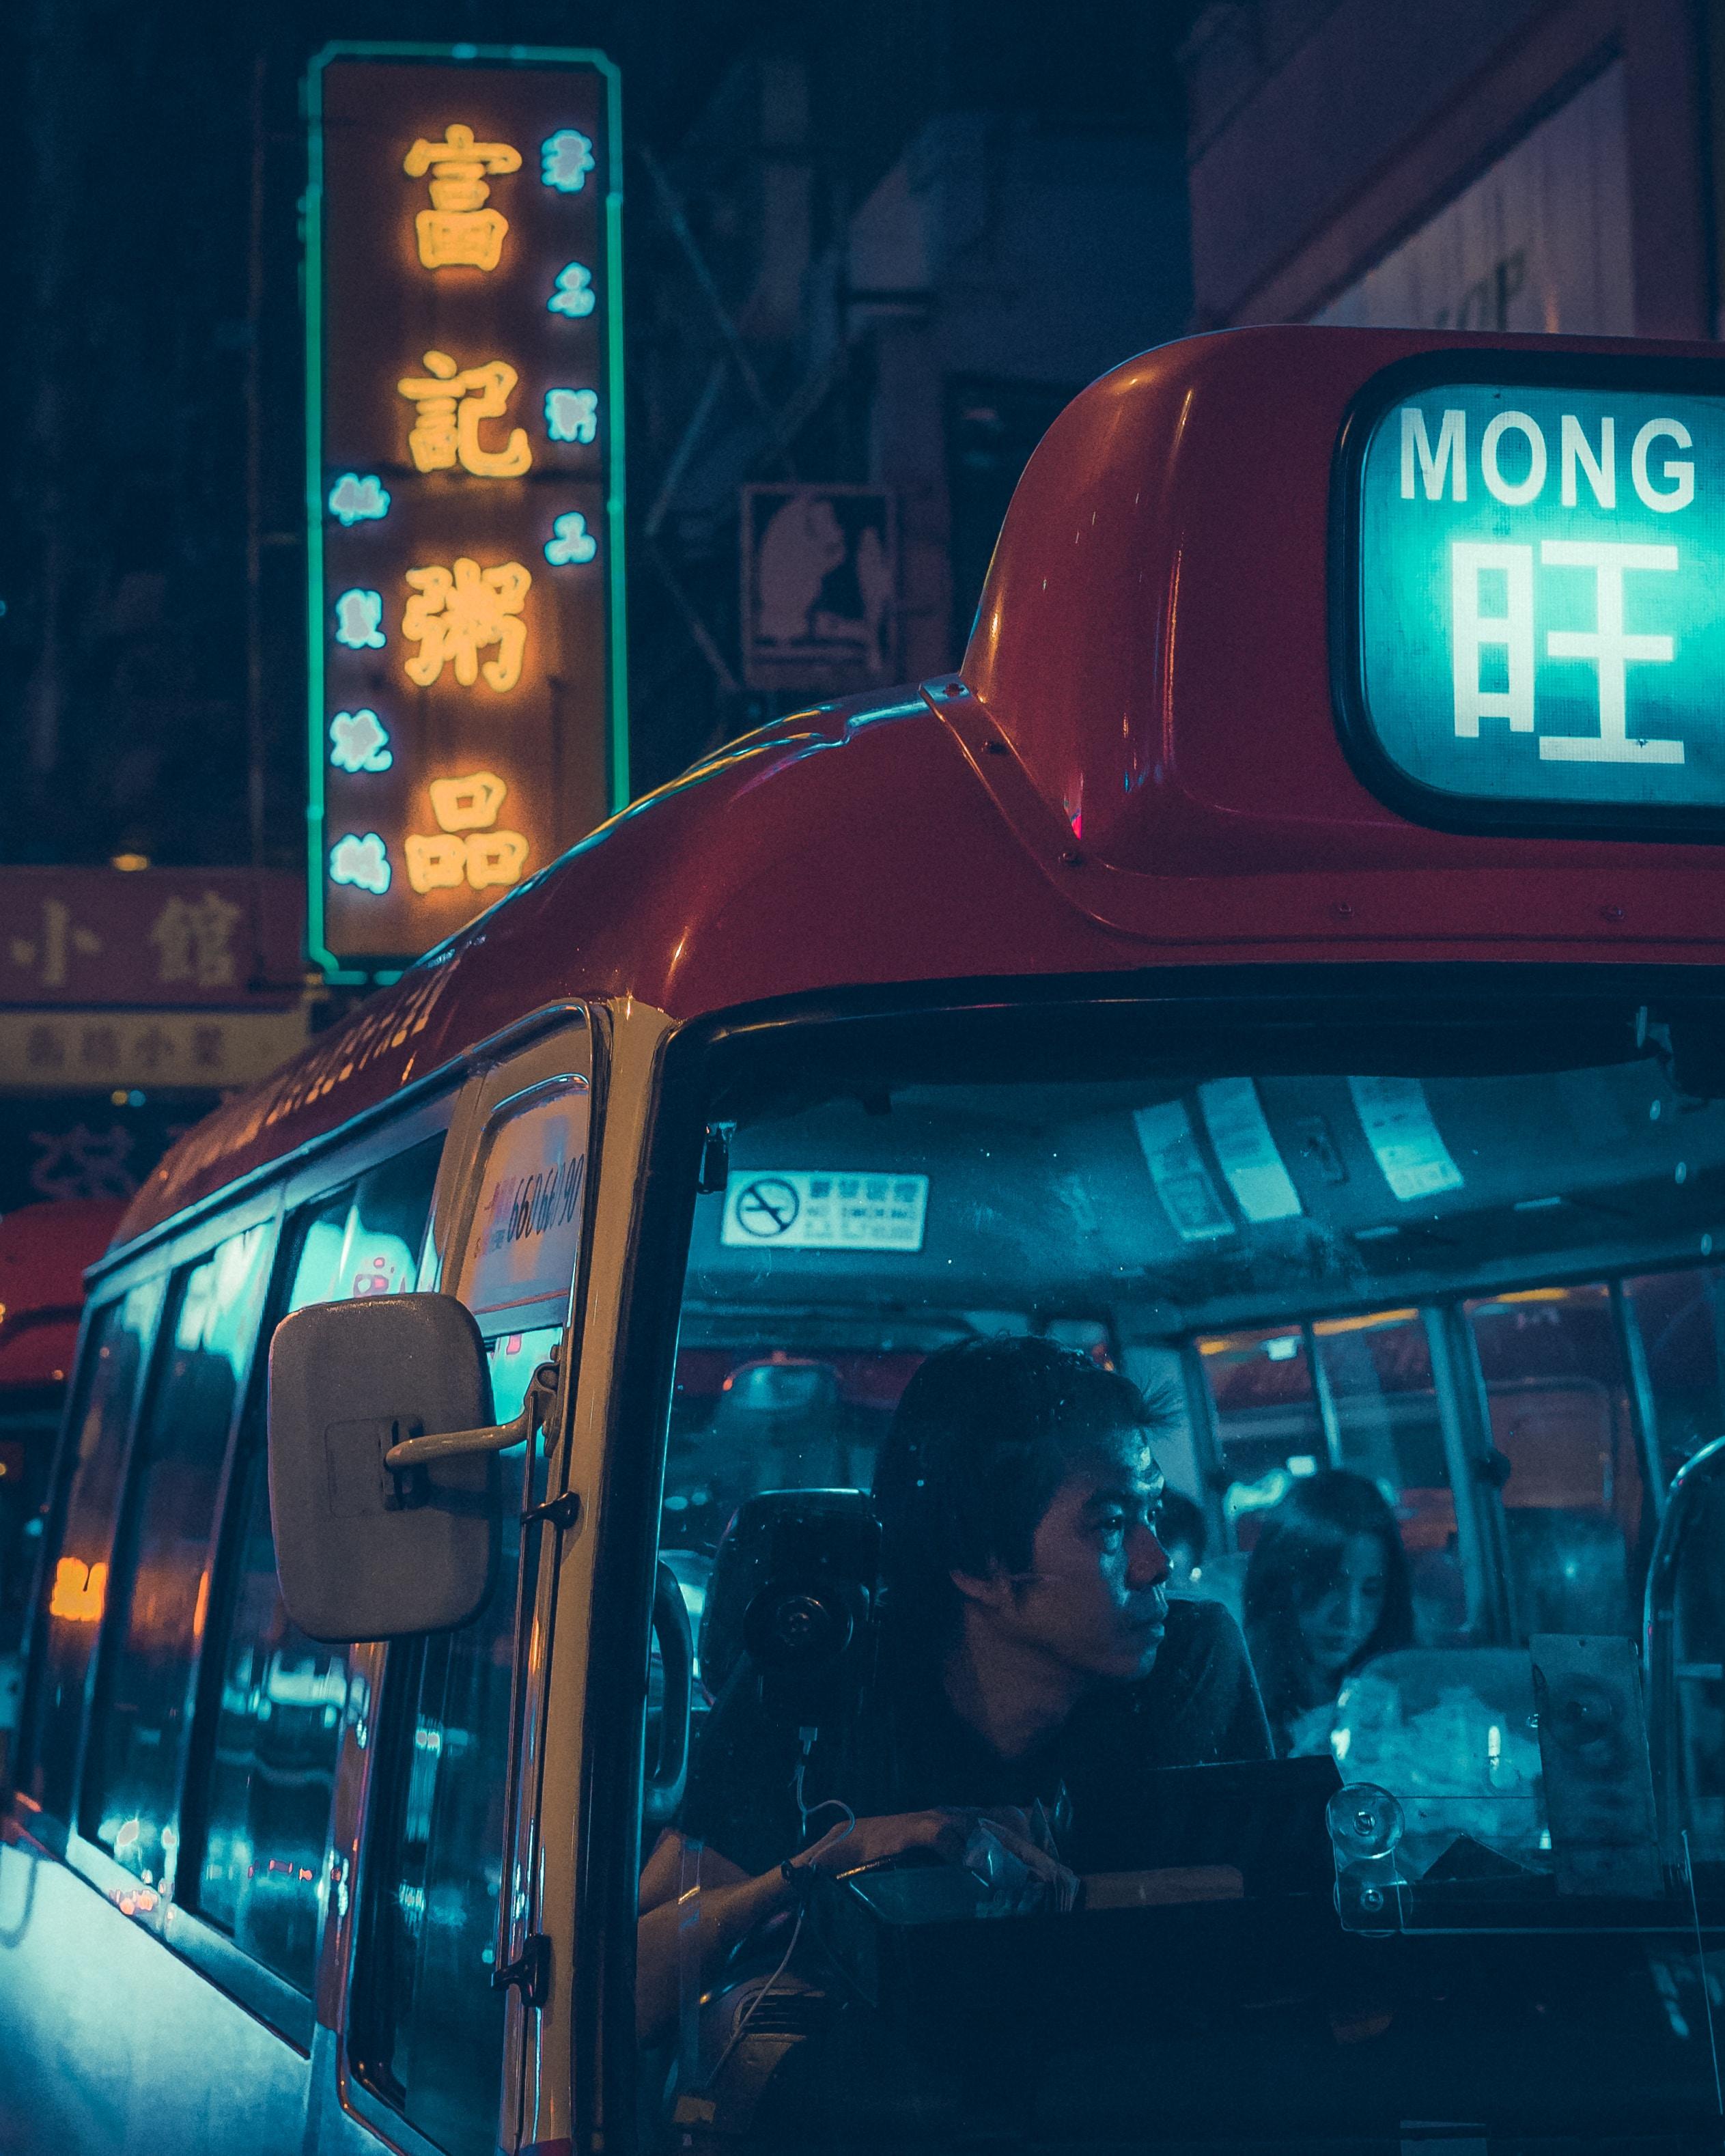 people riding bus during nighttime